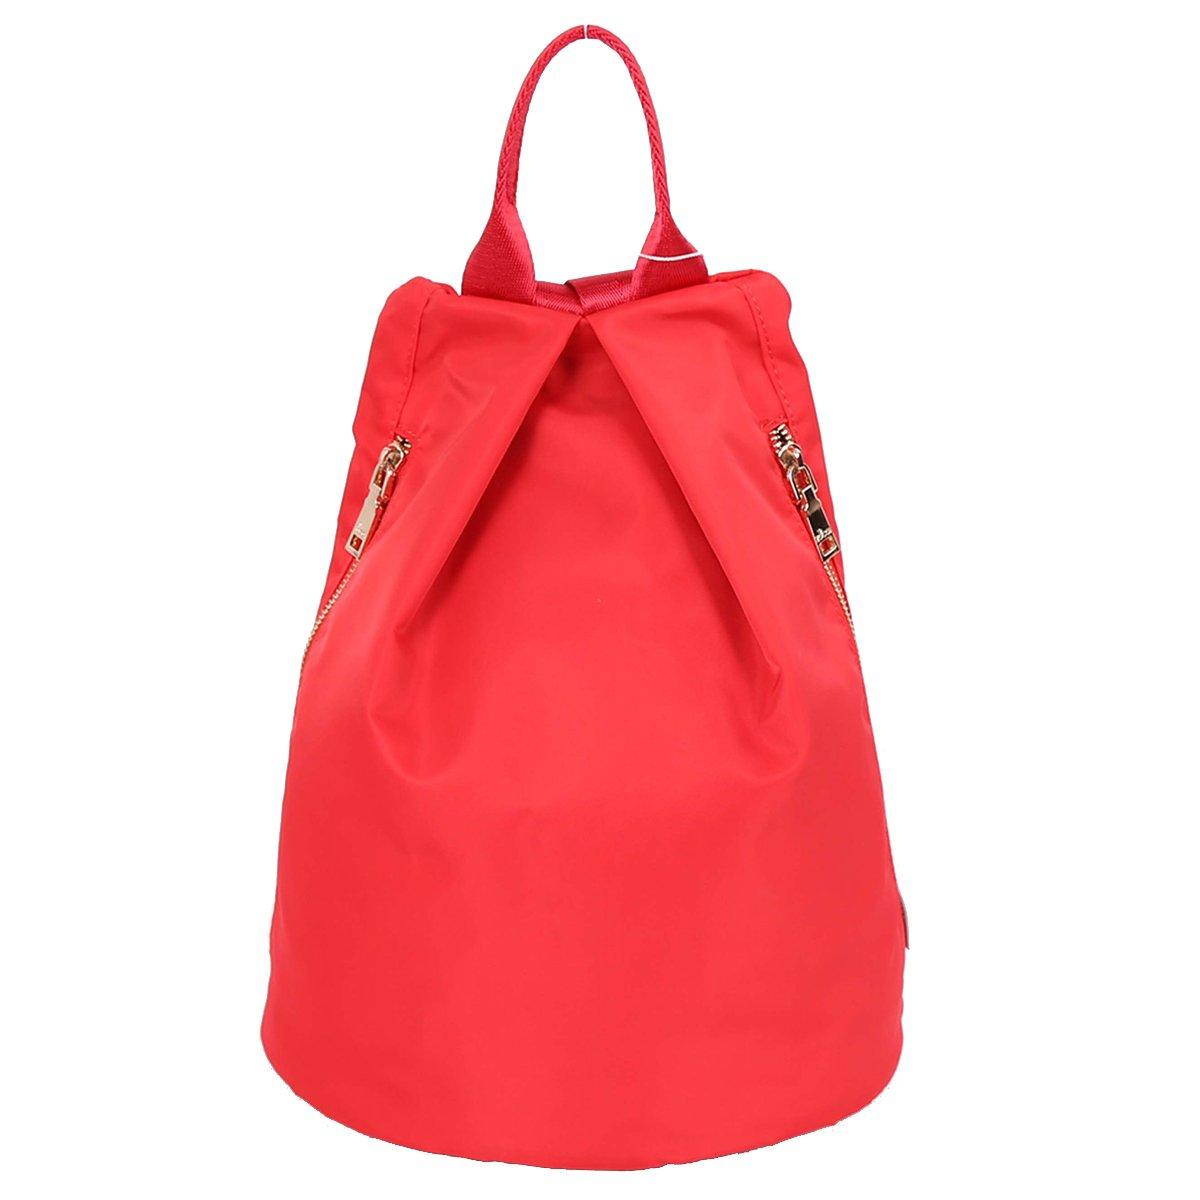 ZOCAI Nylon Fabric Unisex Barrel Backpack Handbags Puses Casual Day Backpack Clearance K15657